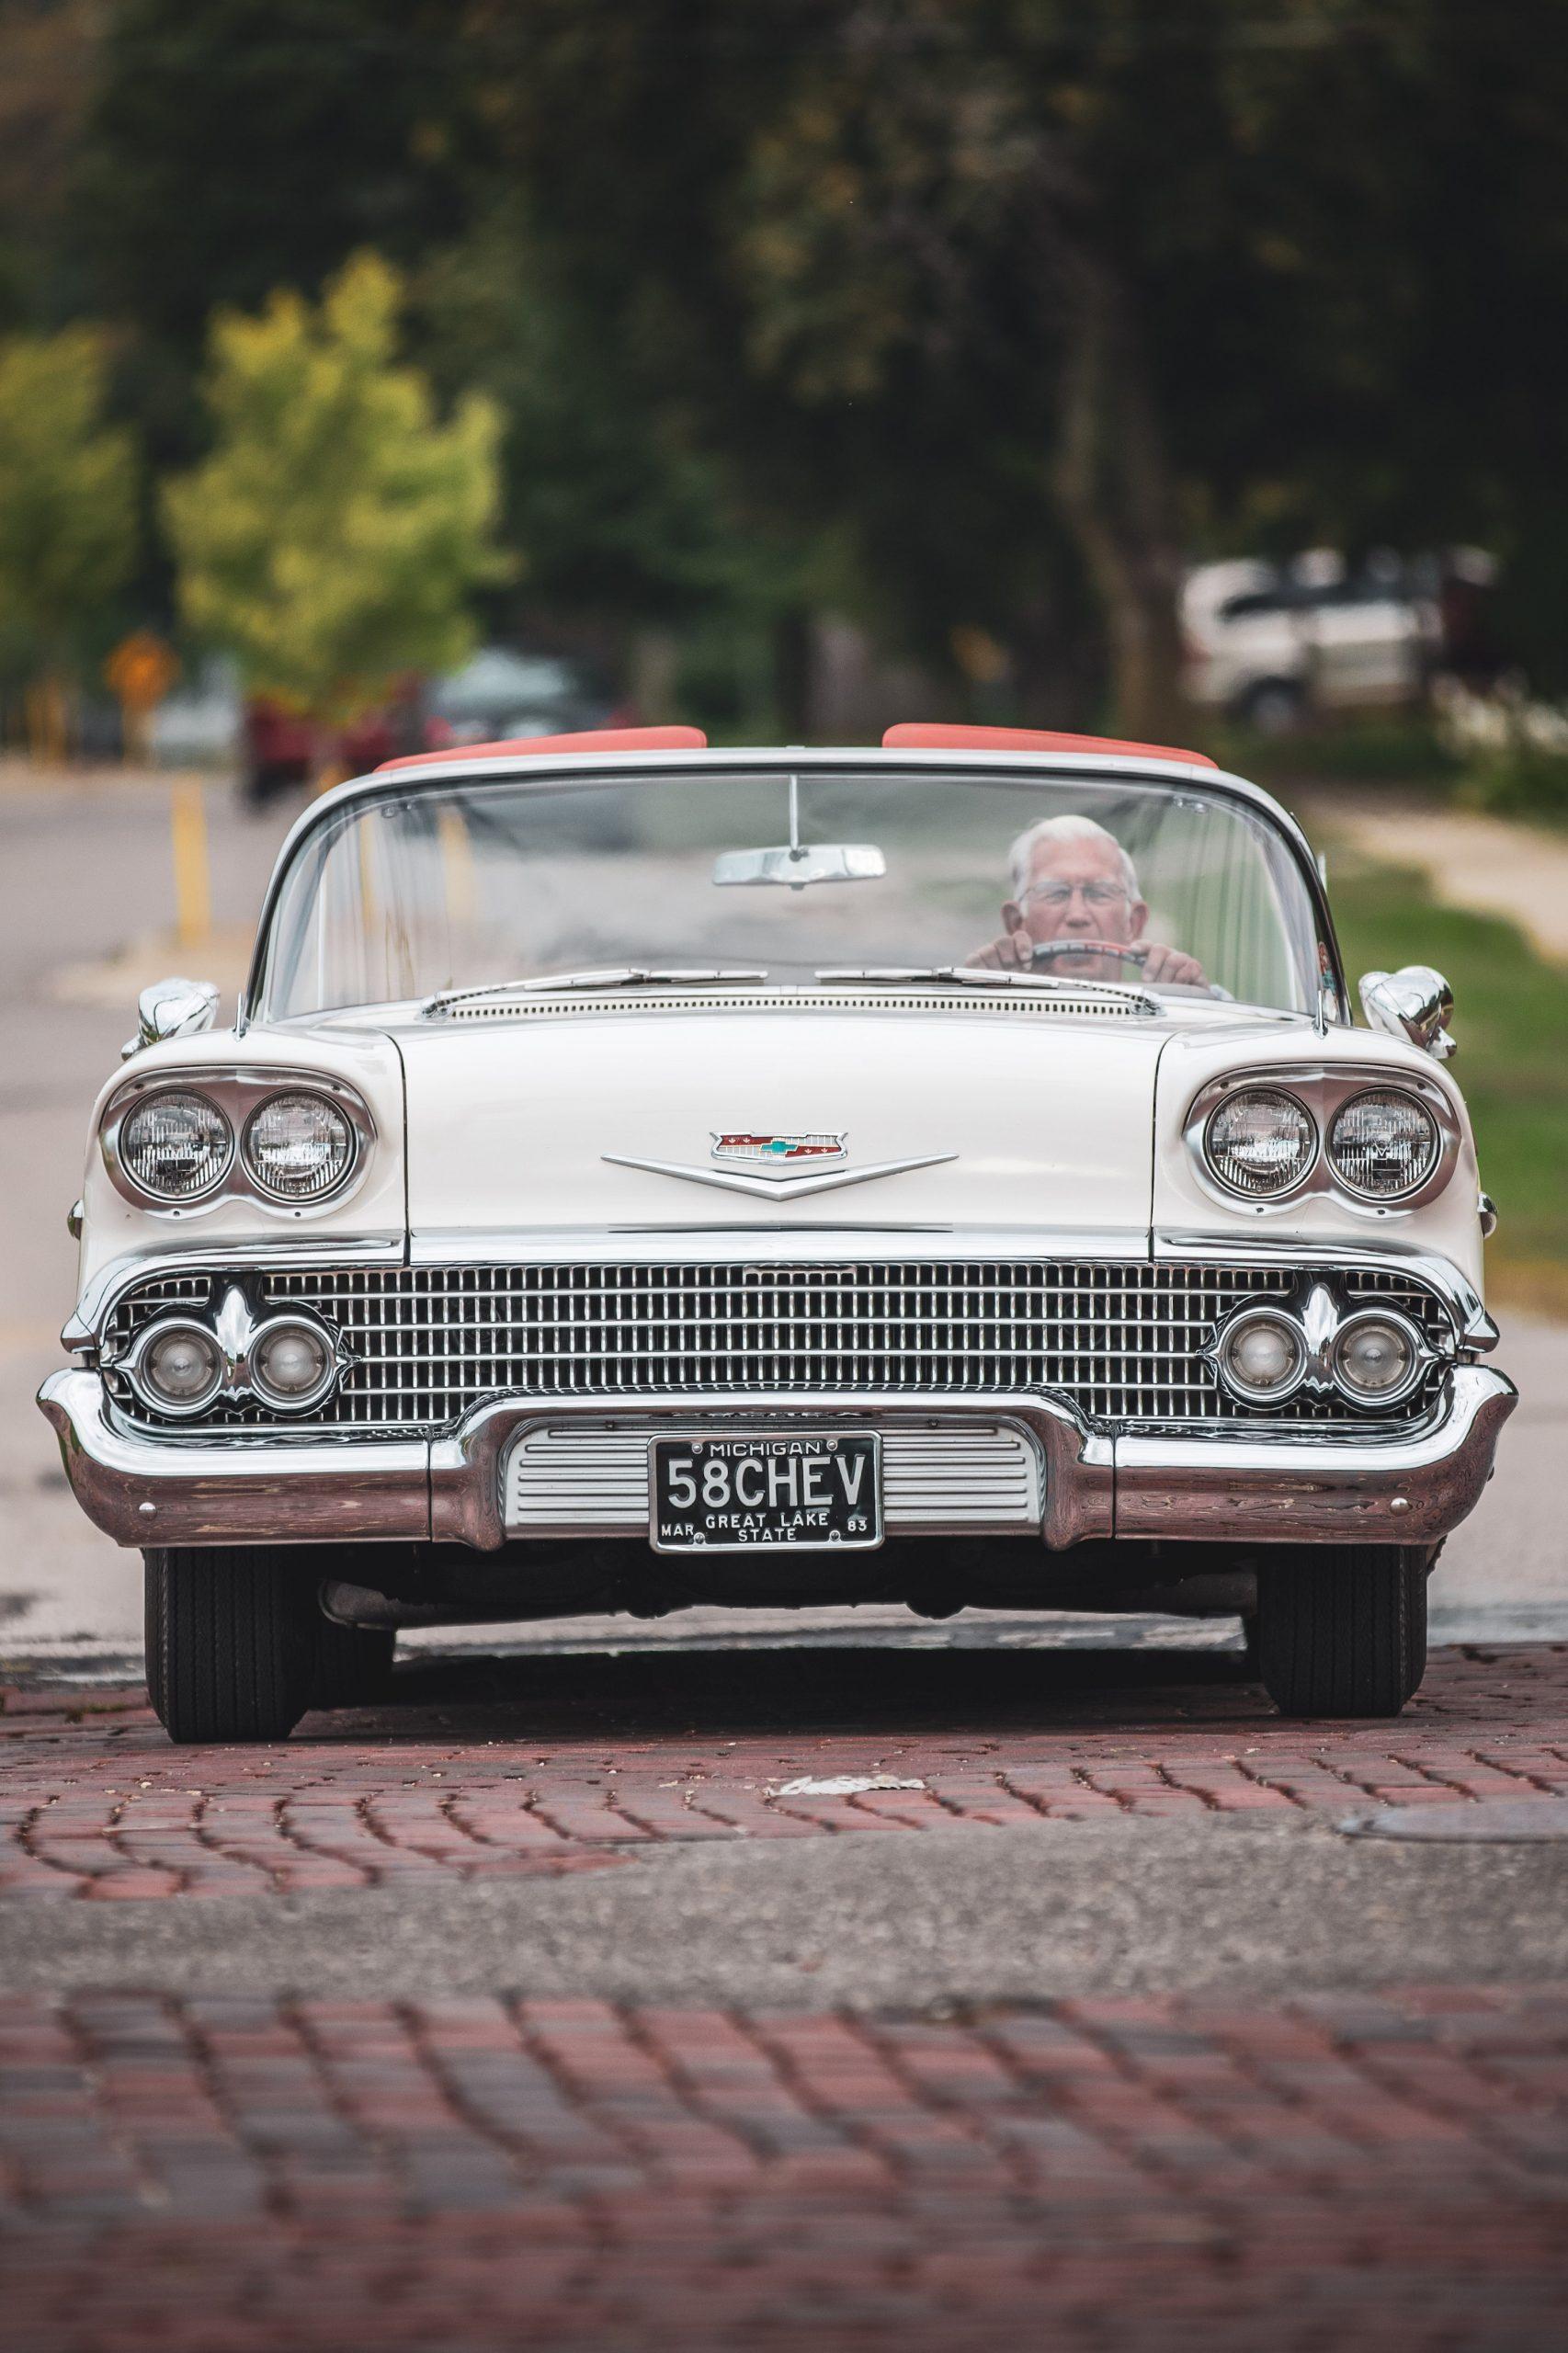 1958 Chevrolet Impala Convertible Front